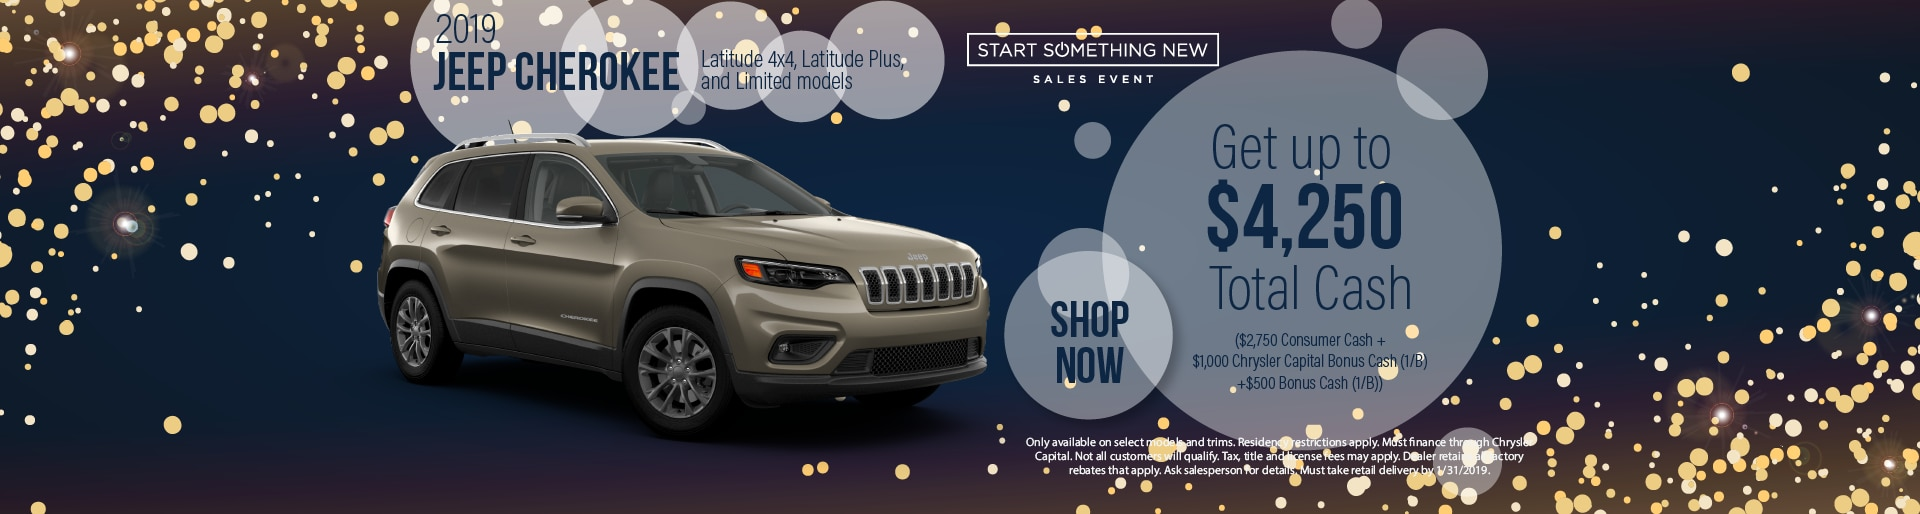 bob brady dcjrf 2018 2019 new dodge chrysler jeep ram fiat used car dealer decatur il. Black Bedroom Furniture Sets. Home Design Ideas